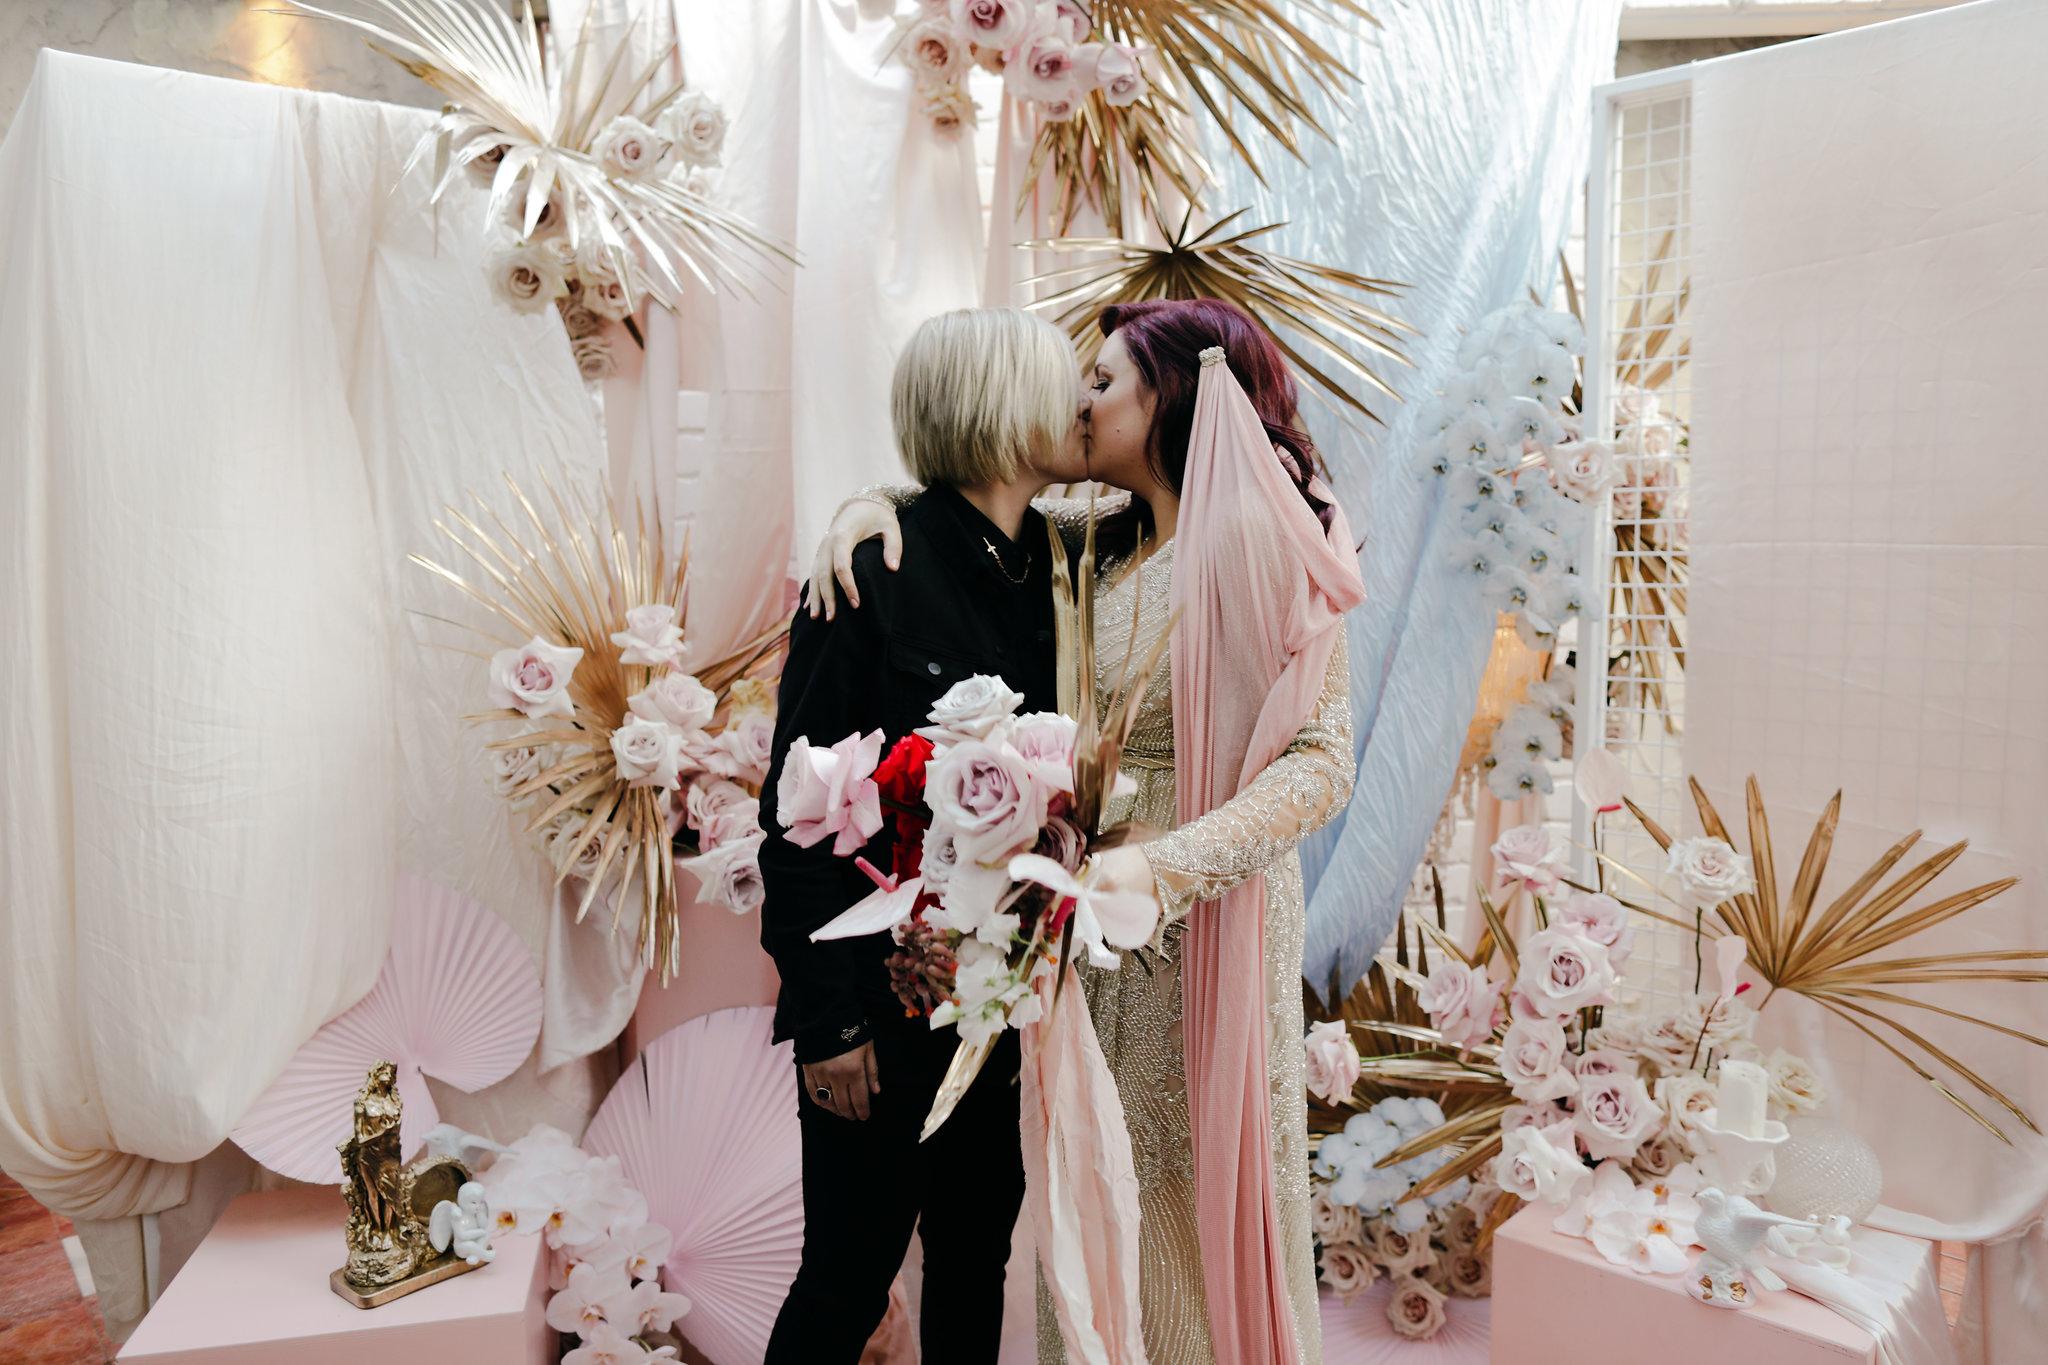 ceremony 1.jpgLara + Cass Bohemian Blooms Juliet's bedroom ceremony true love's kiss